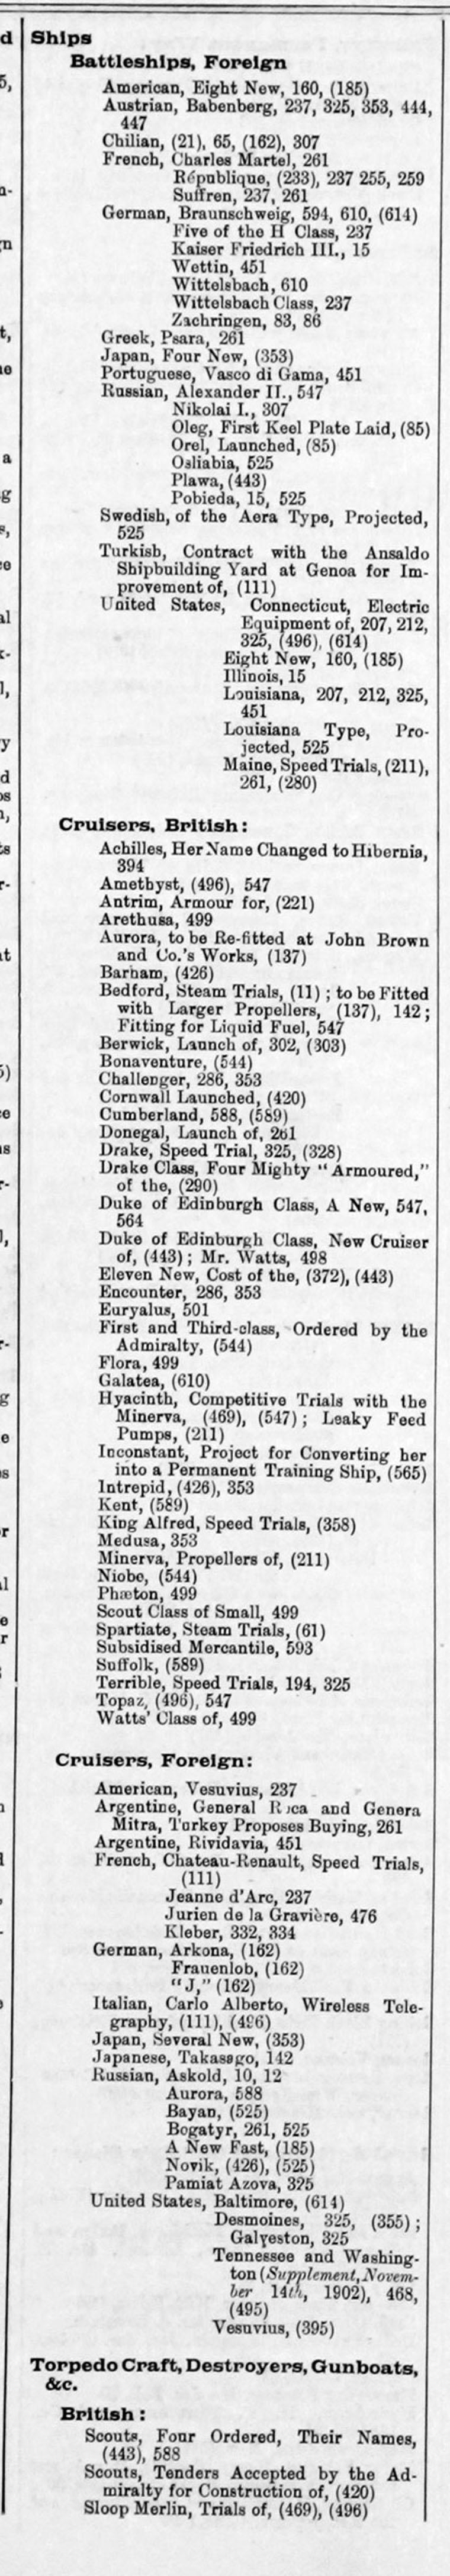 The Engineer 1902 Jul-Dec: Index: Miscellaneous - Graces Guide